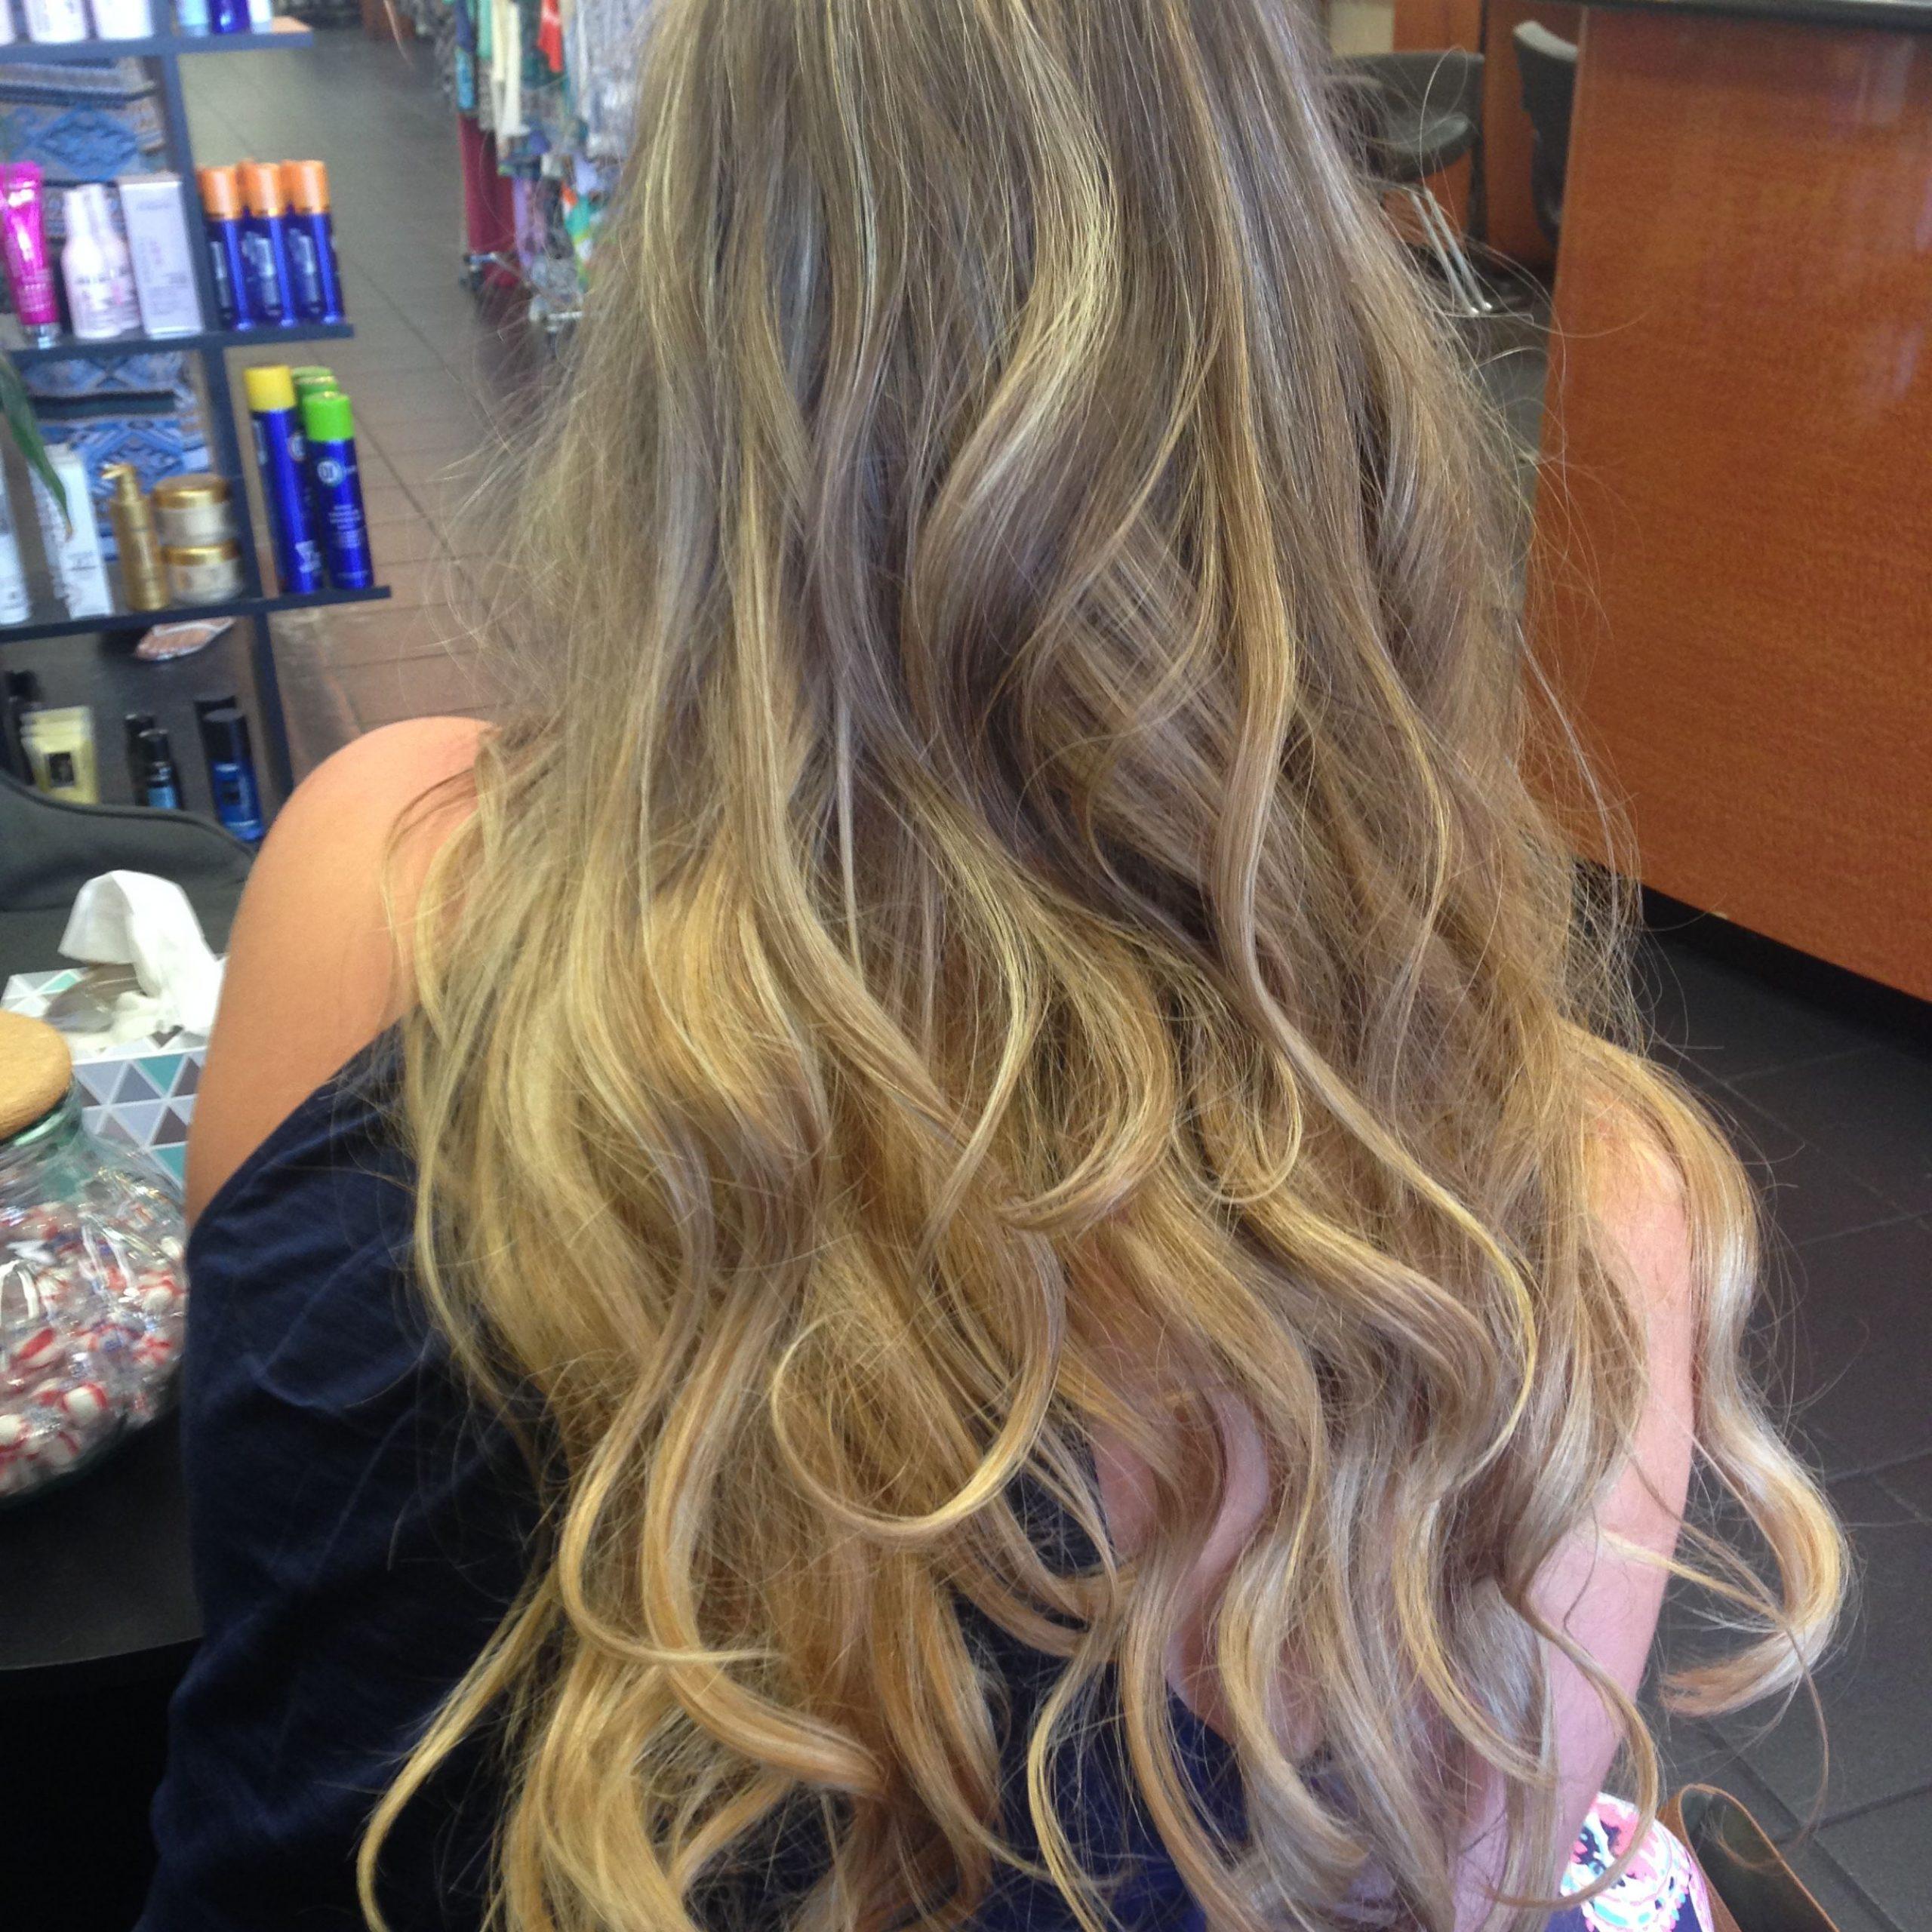 Pinhairby Melinda Jupiter Florida On Sun Kissed Hair Regarding Short Sun Kissed Hairstyles (View 17 of 20)